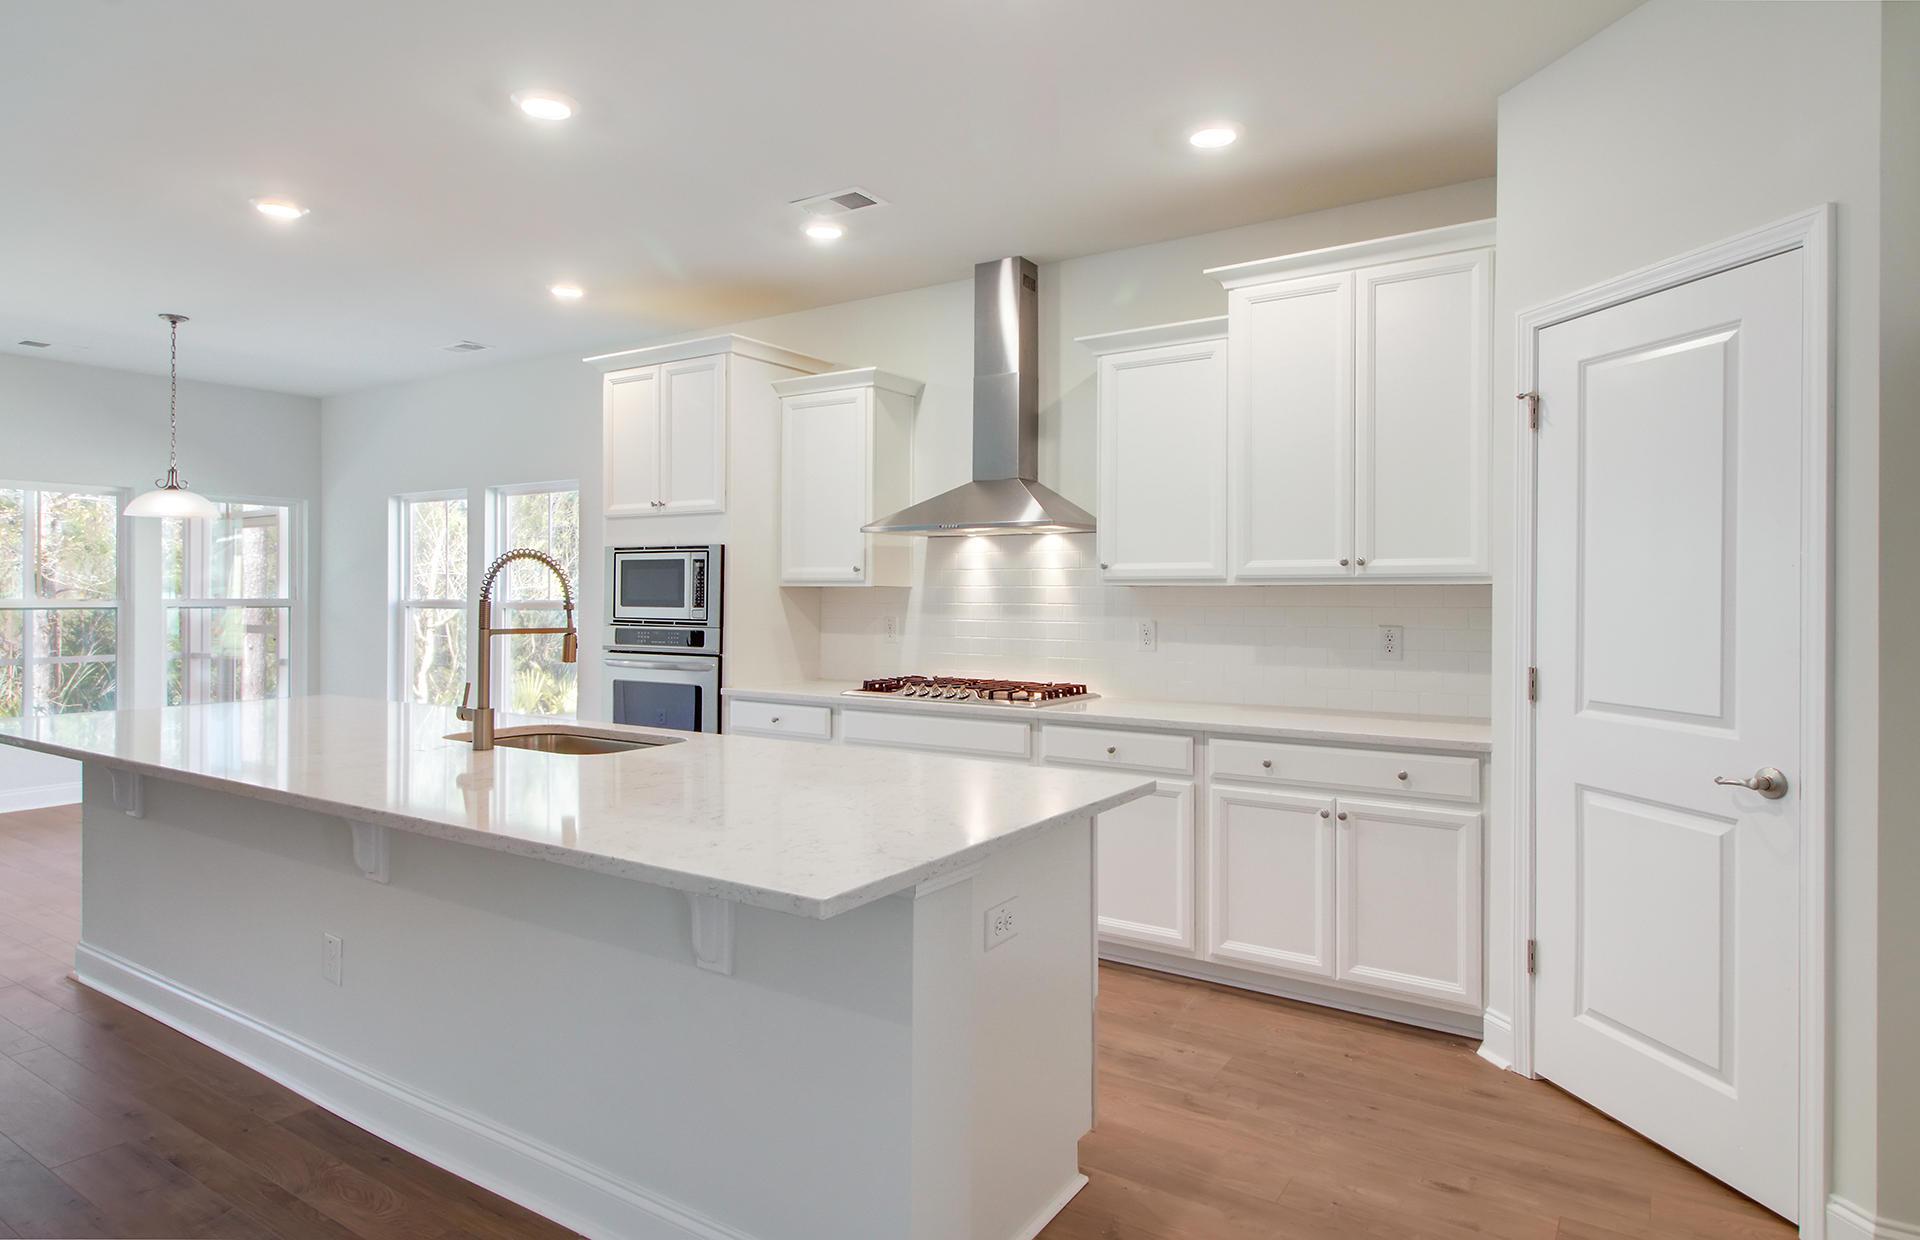 Park West Homes For Sale - 3066 Rice Field, Mount Pleasant, SC - 57